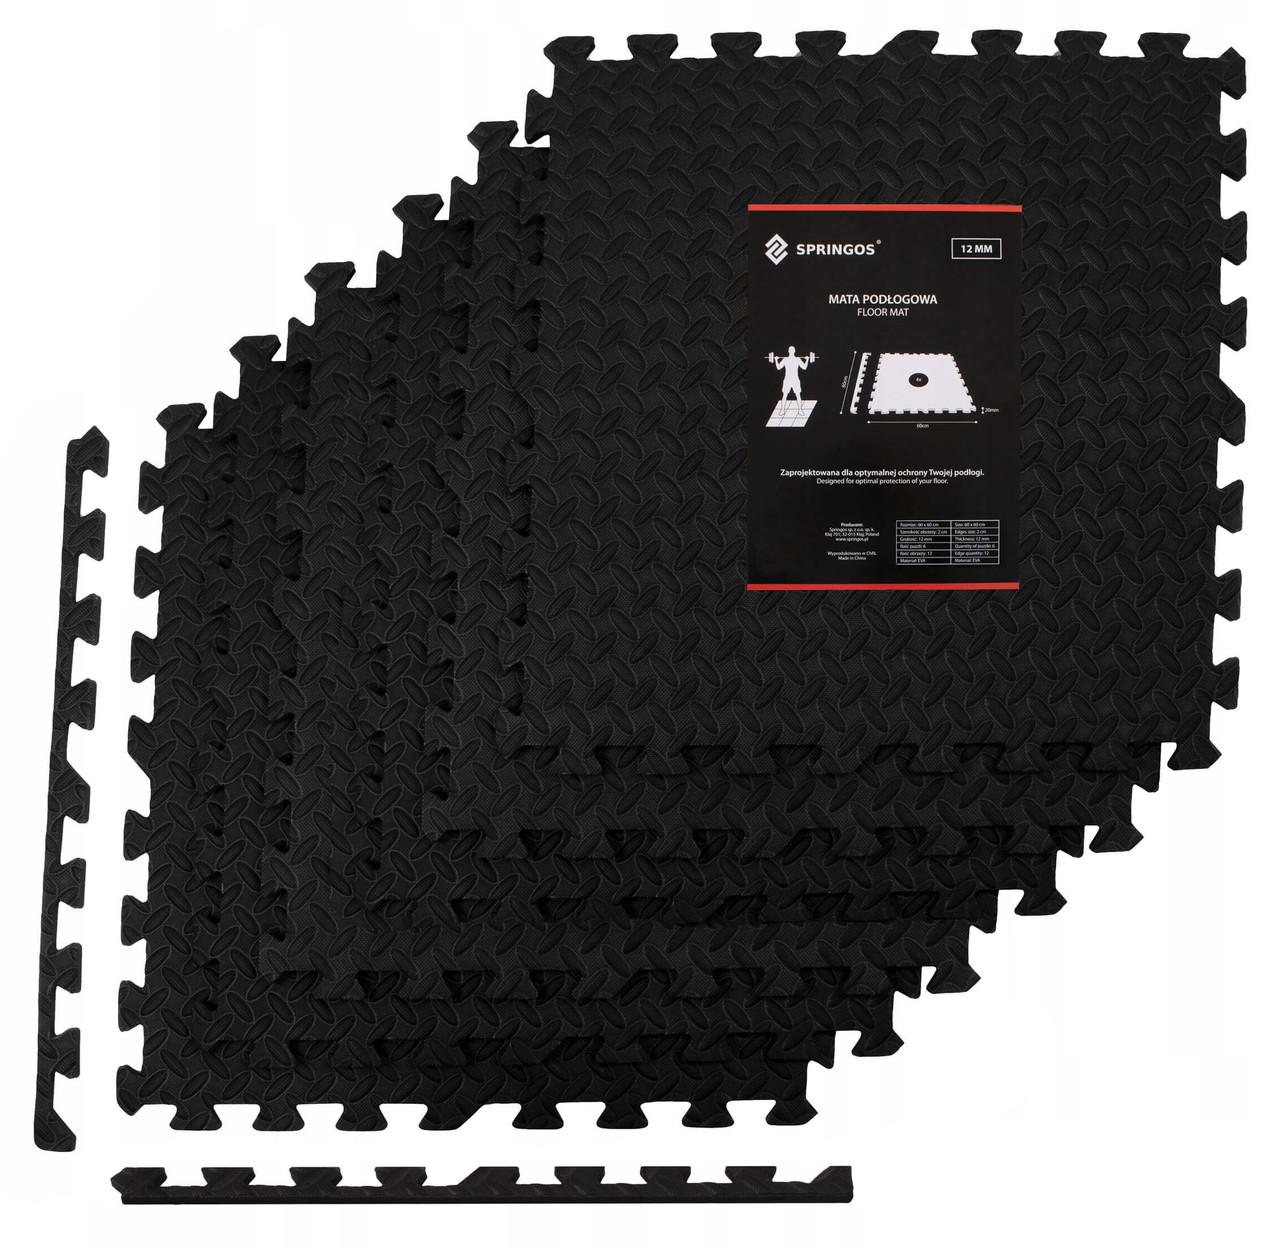 Мат-пазл (ласточкин хвост) Springos Mat Puzzle EVA 180 x 120 x 1.2 cм FM0004 Black. Мат-татами